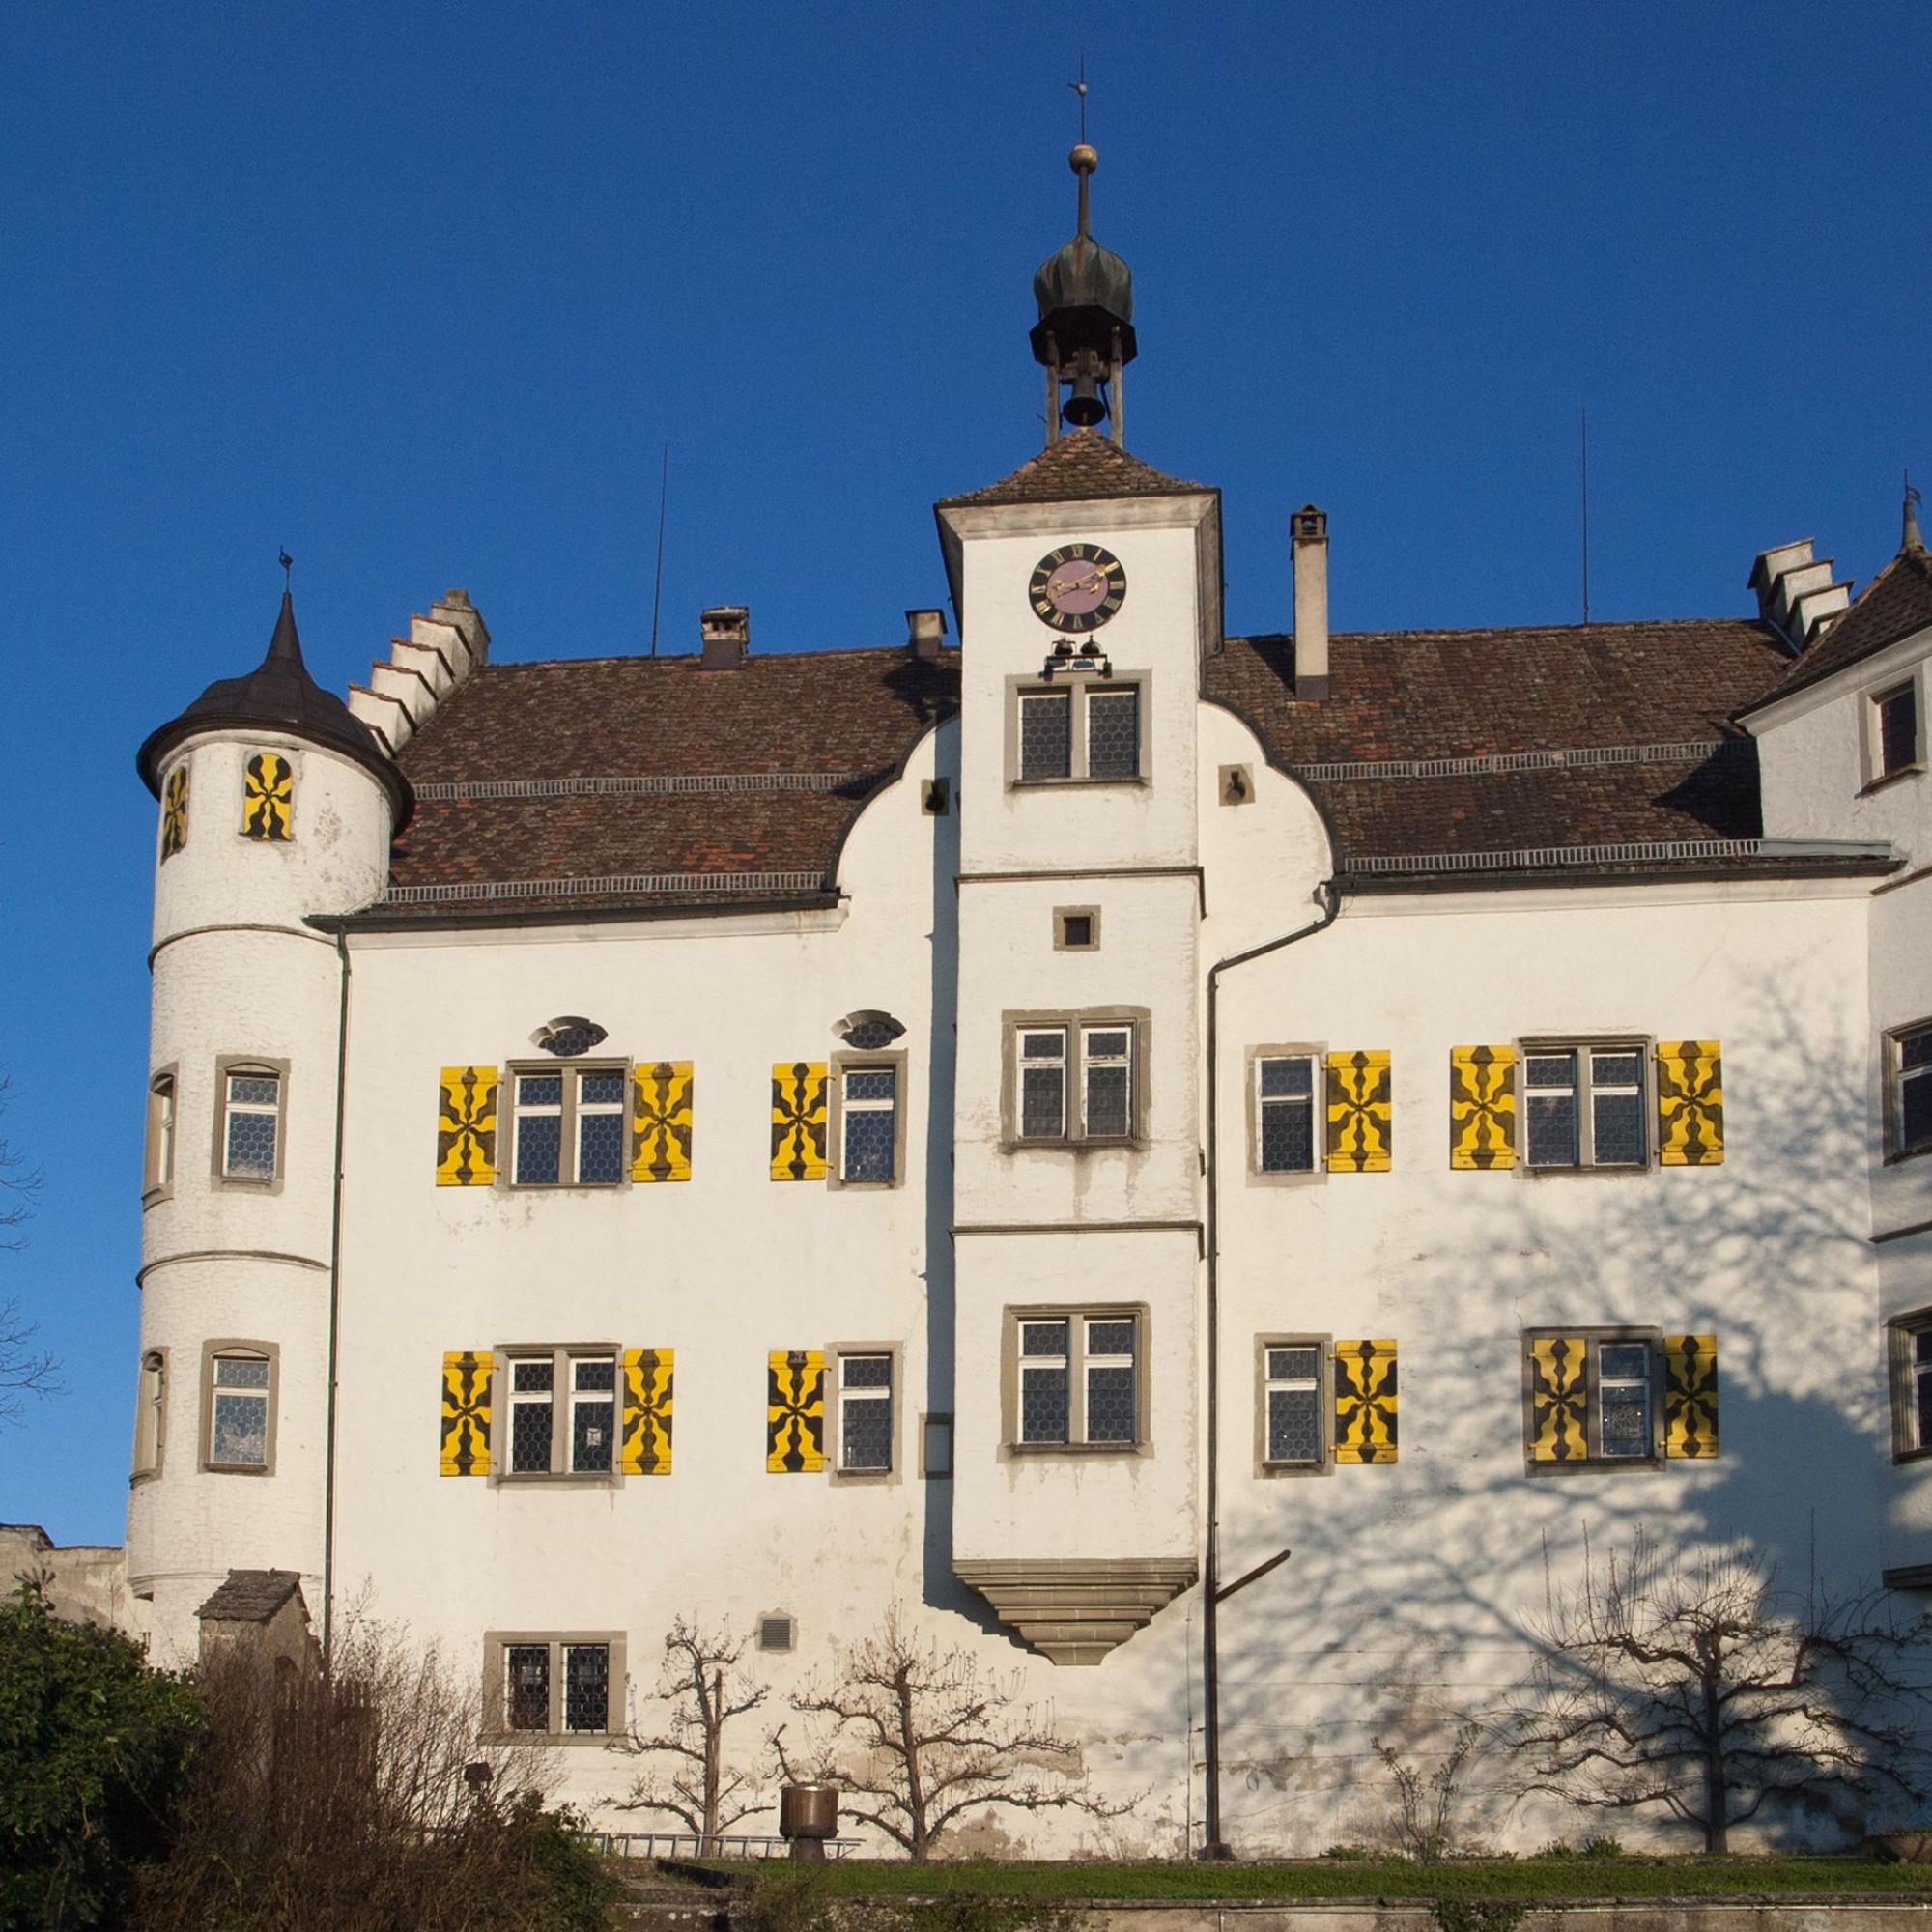 Schloss Sonnenberg in Stettfurt